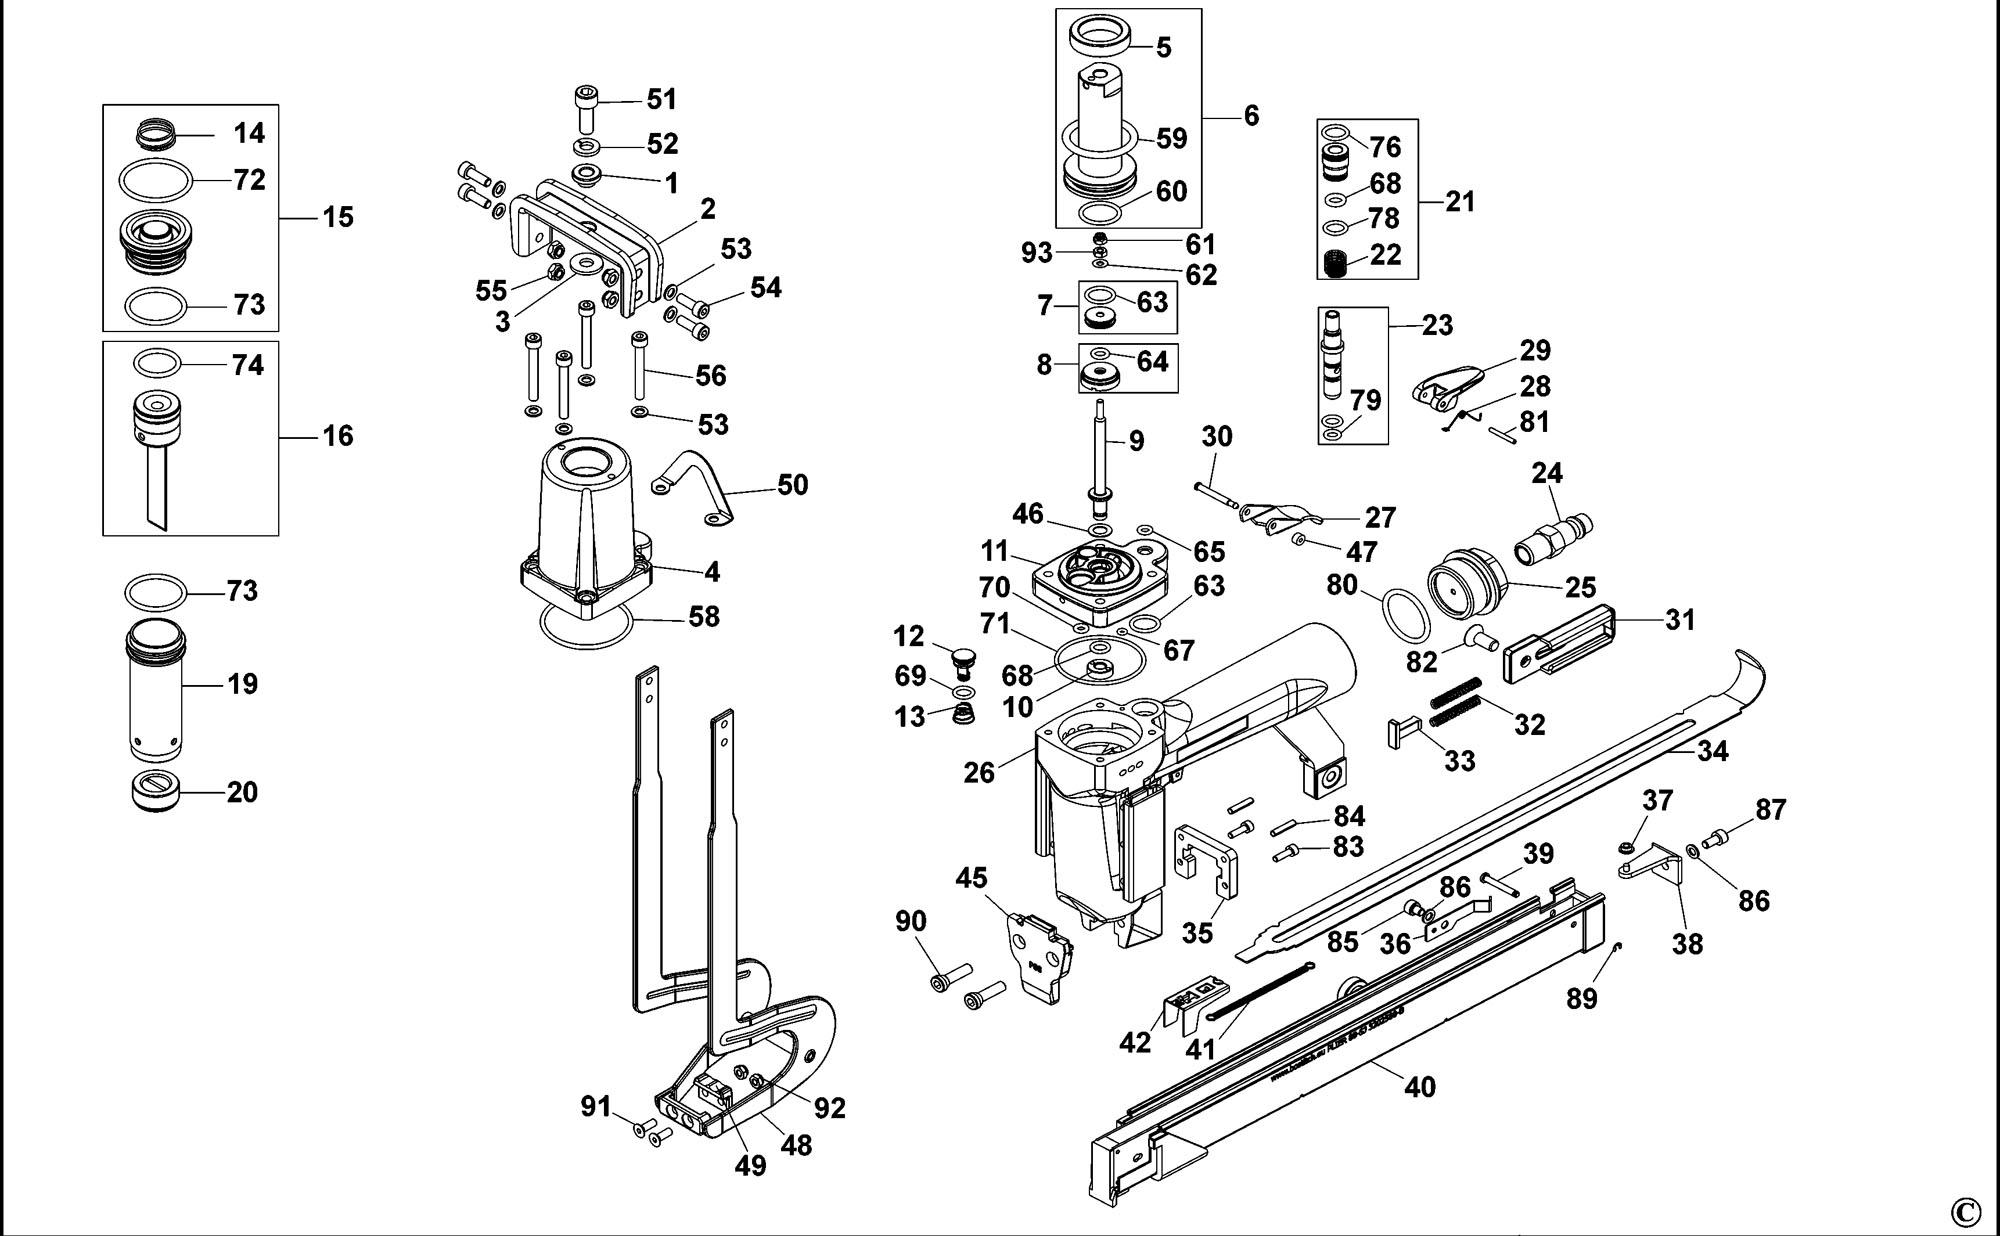 Spares For Bostitch P110sj Pneumatic Stapler Type Revc